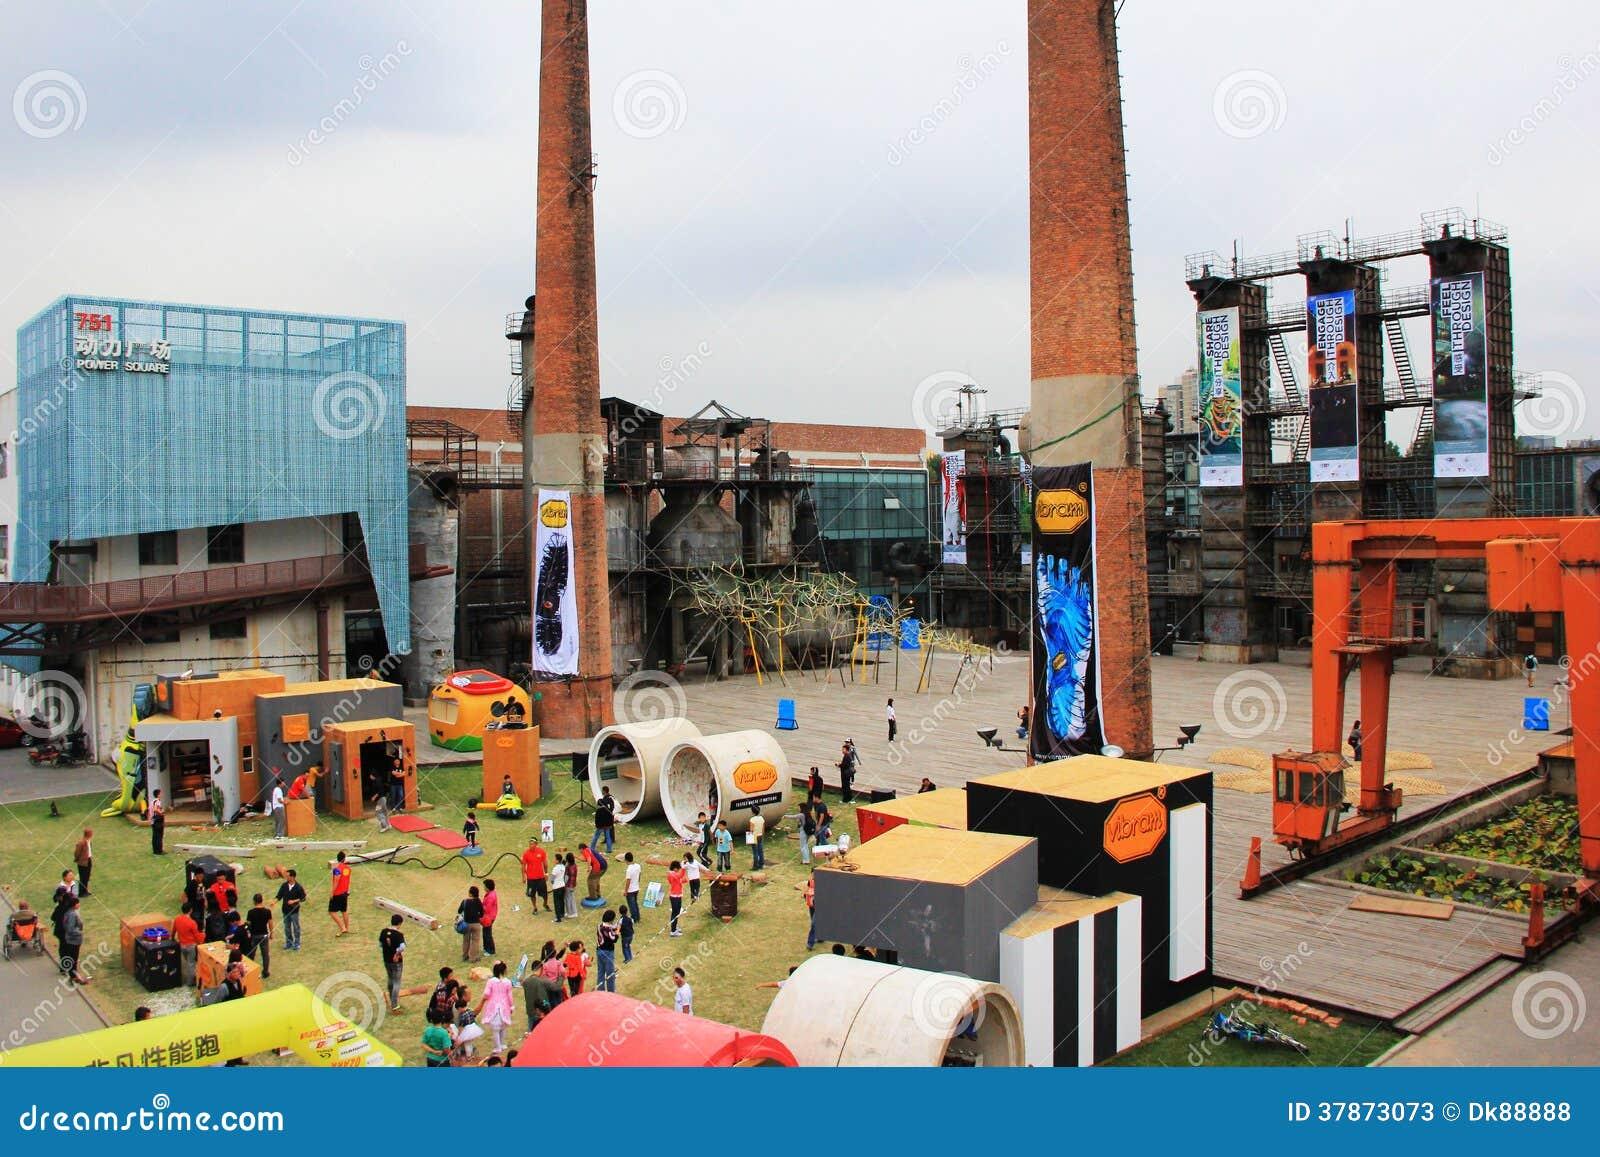 beijing creative park inside 37873073